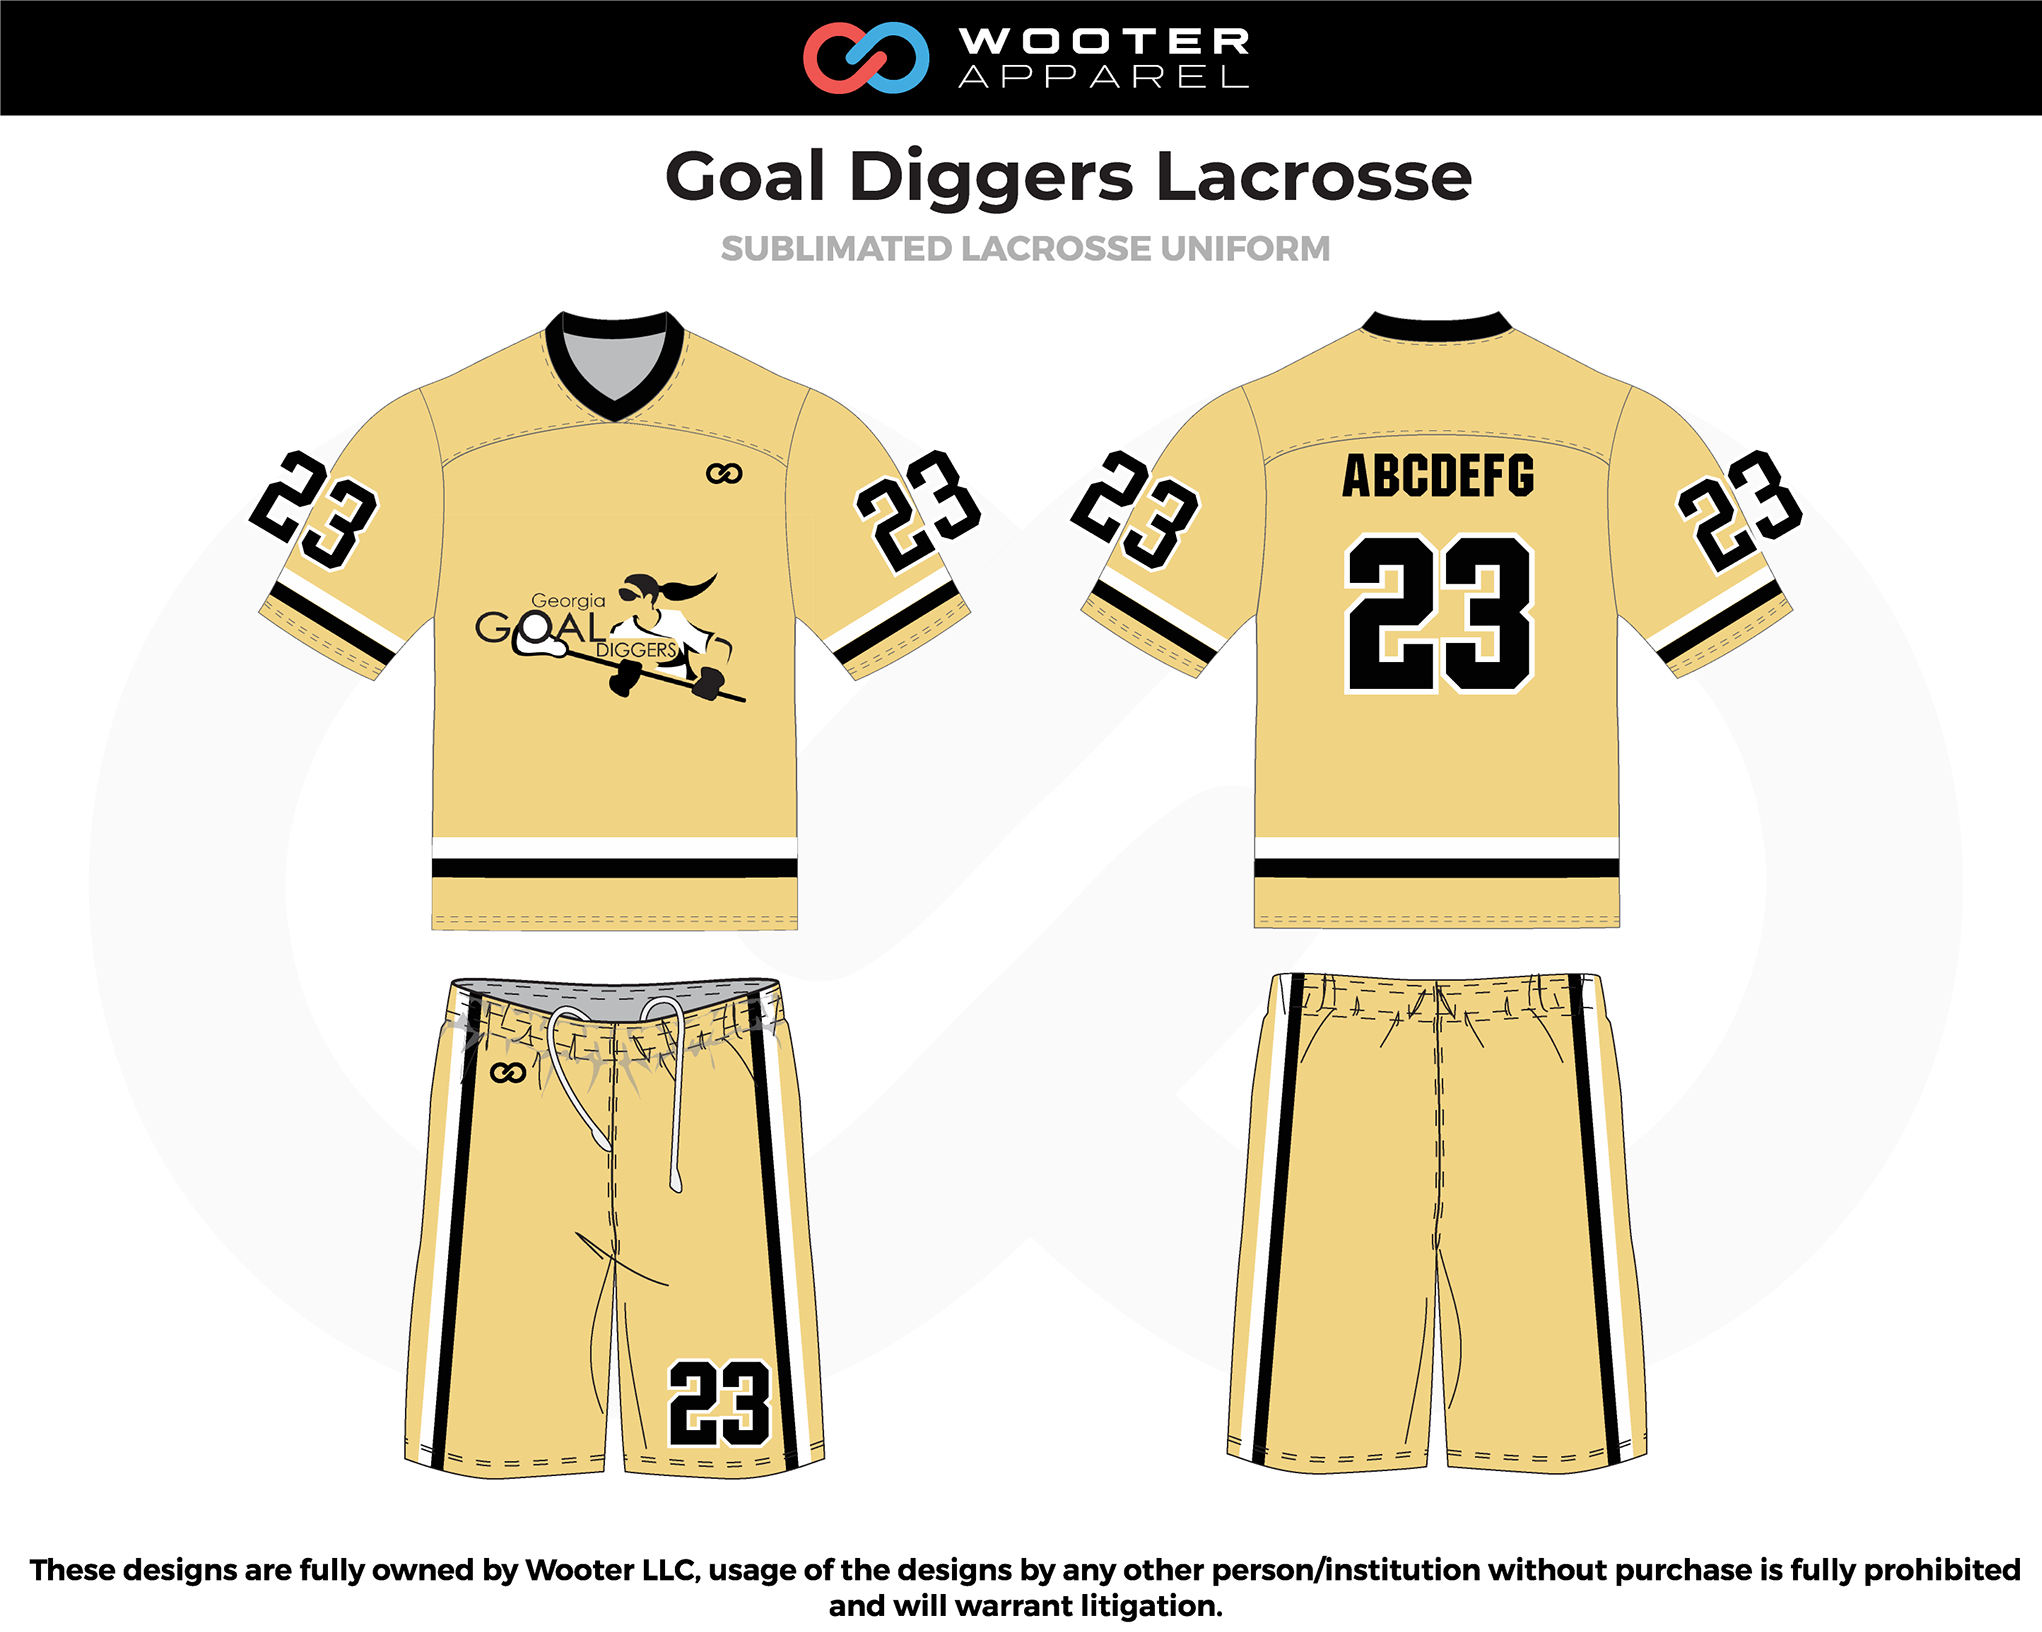 2019-02-04 Goal Diggers Lacrosse Reversible Uniform (Gold Side).png